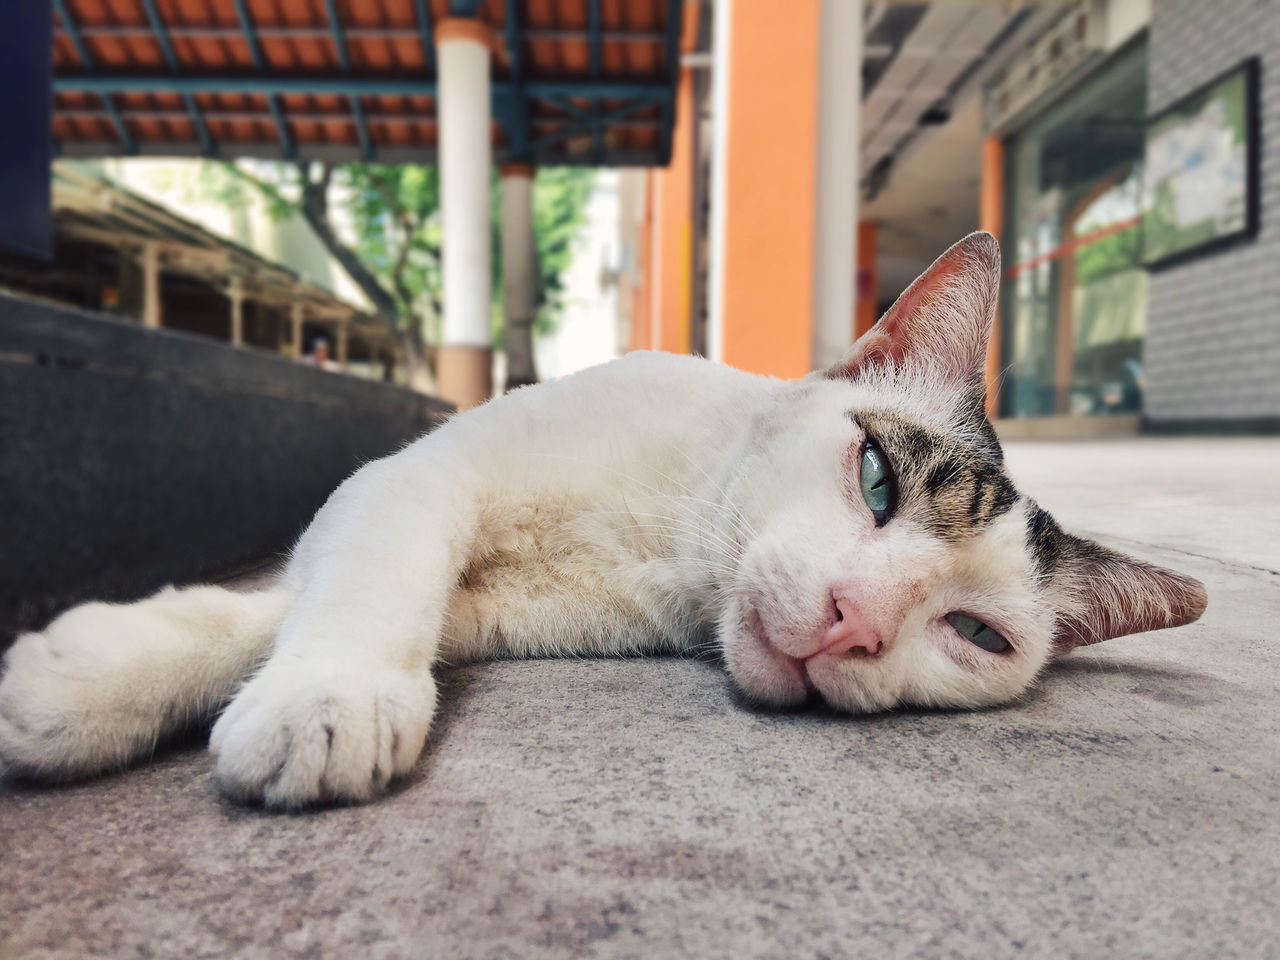 catzZzzzz zzz... Awake Cat Close-up Lazy Lying Down Monday Blues One Animal Relaxation Sleep Sleeping Sleeping Cat Sleepy Stray Cat